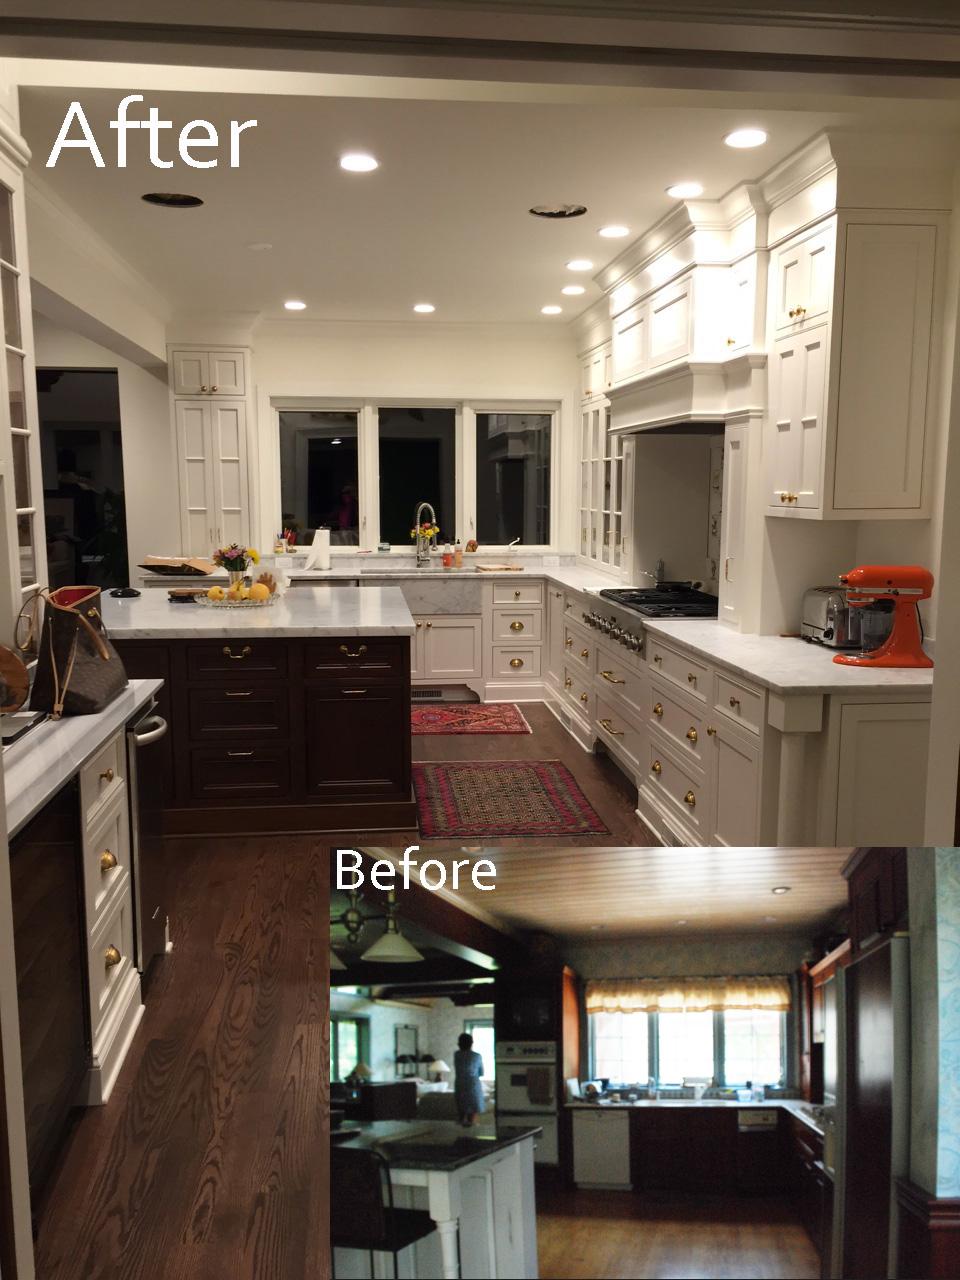 Driscoll Kitchen B4 After 1.jpg